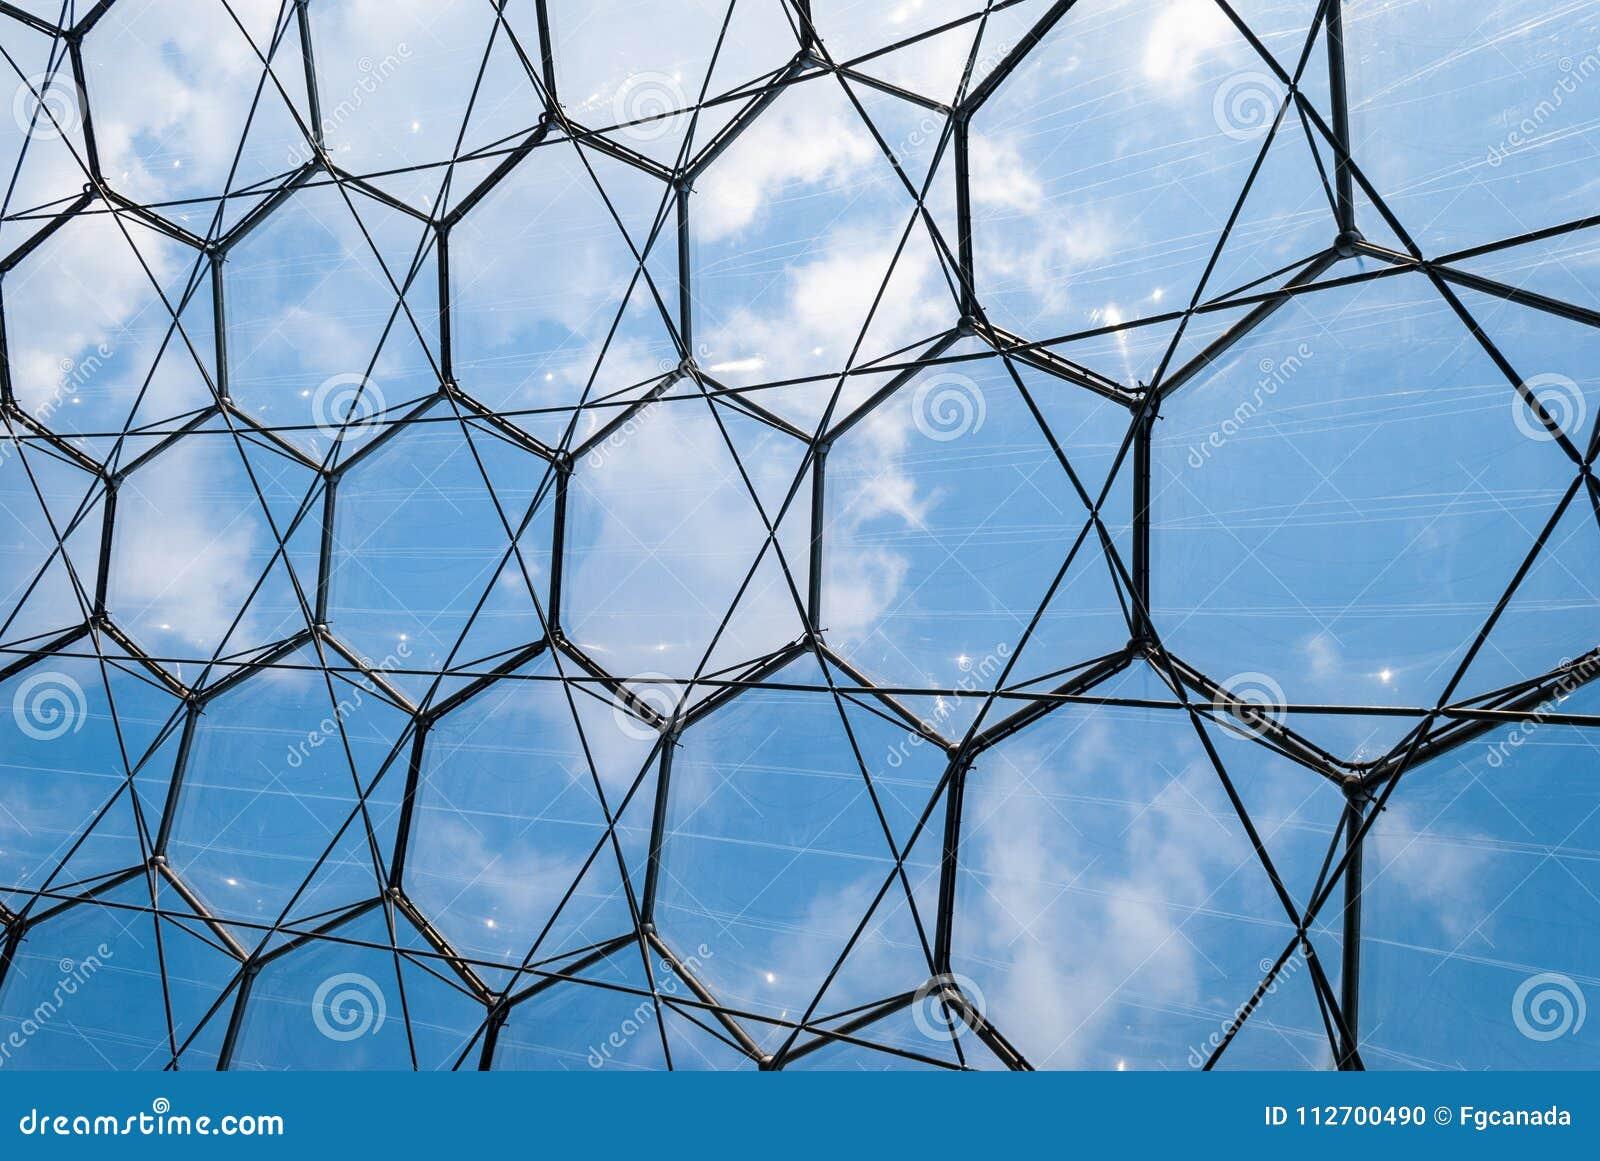 Closeup Of Hexagonal Structure Eden Project Cornwall UK